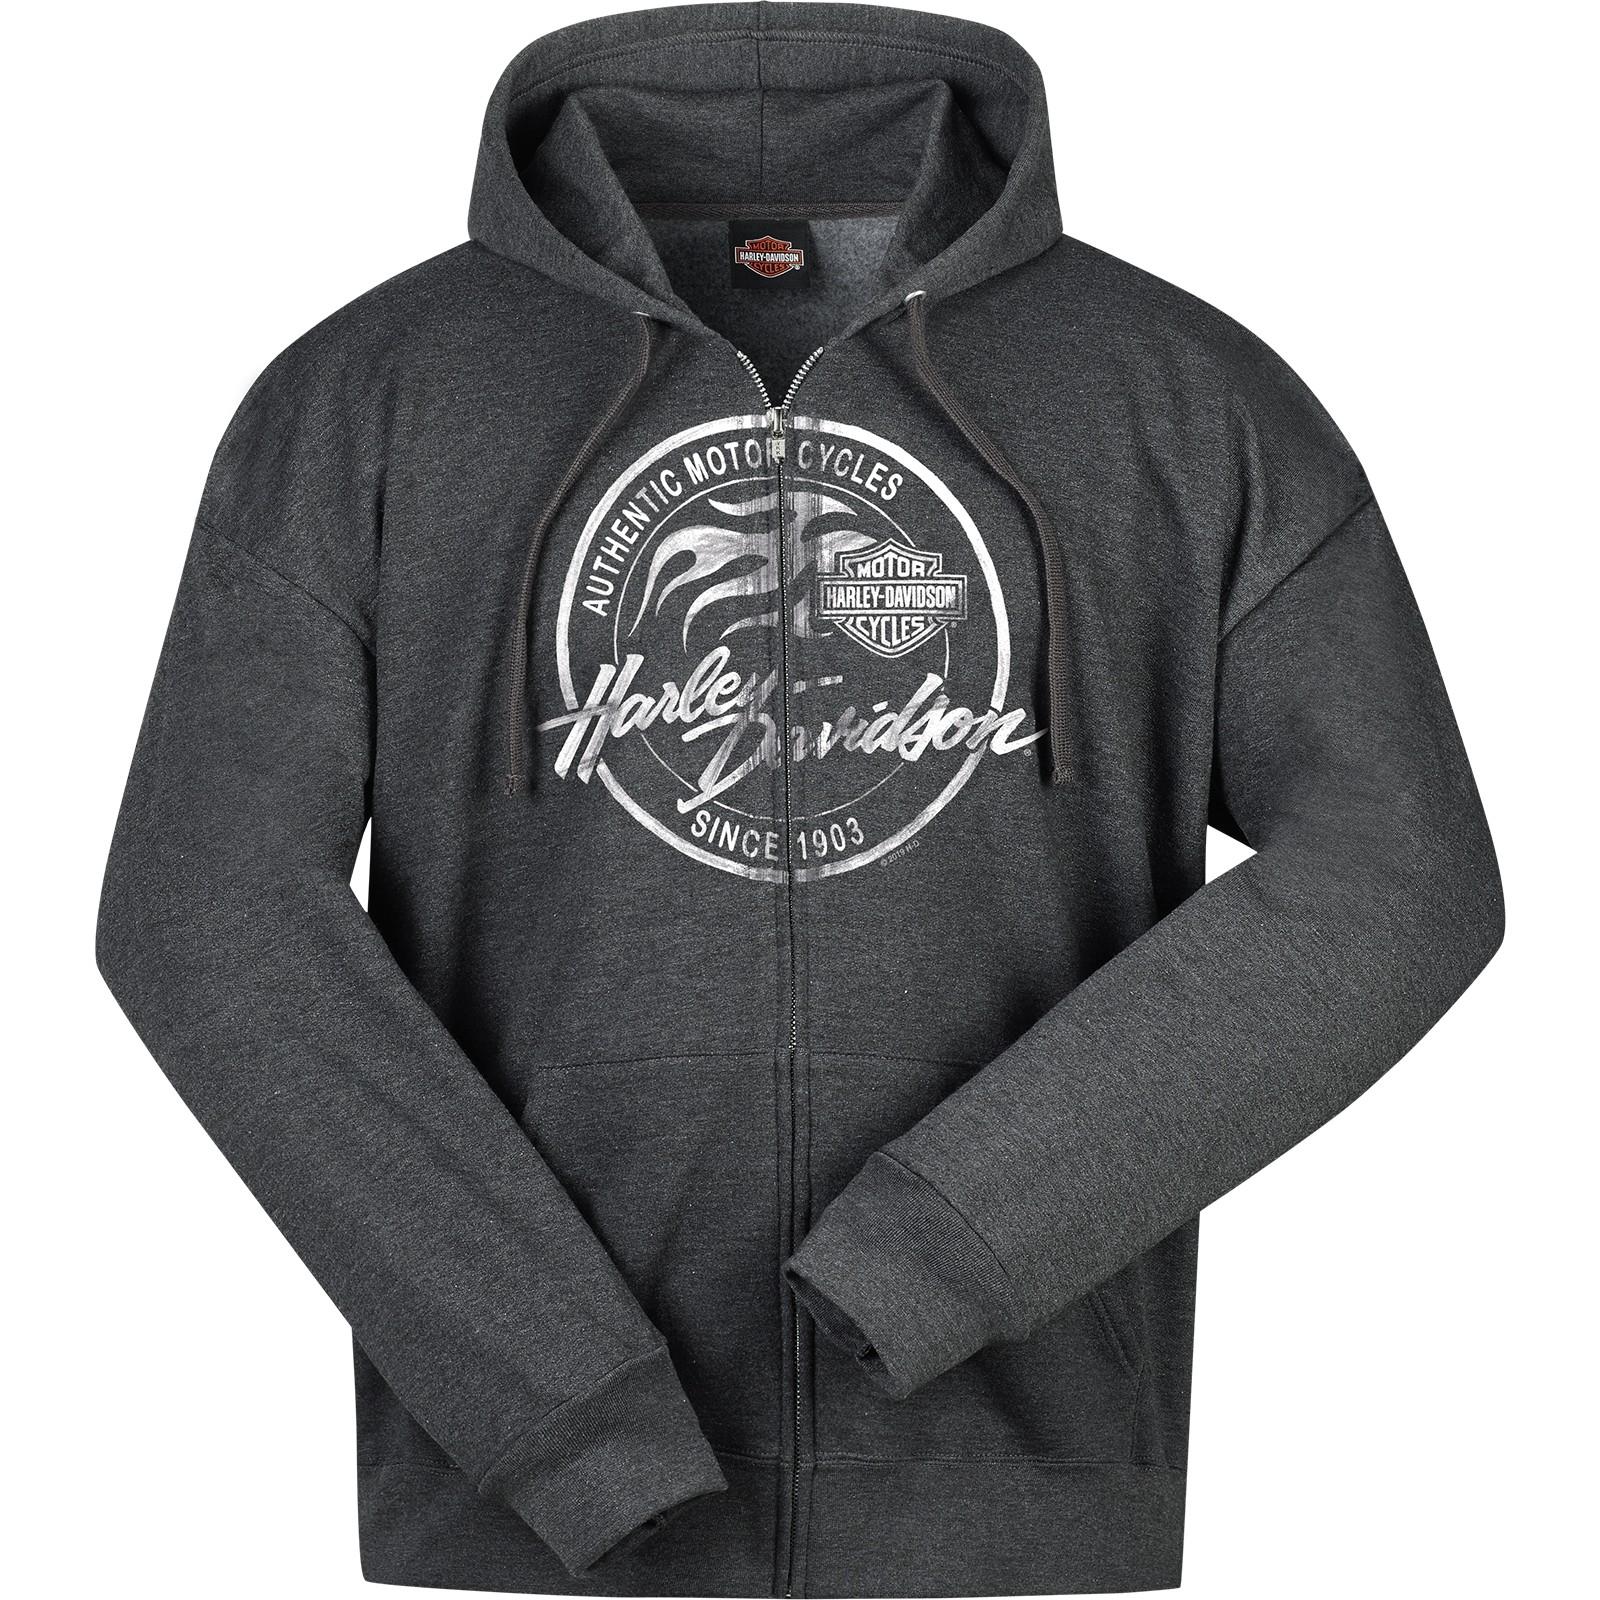 Men's Charcoal Heather Hooded Zippered Sweatshirt - Overseas Tour | Paint Logo